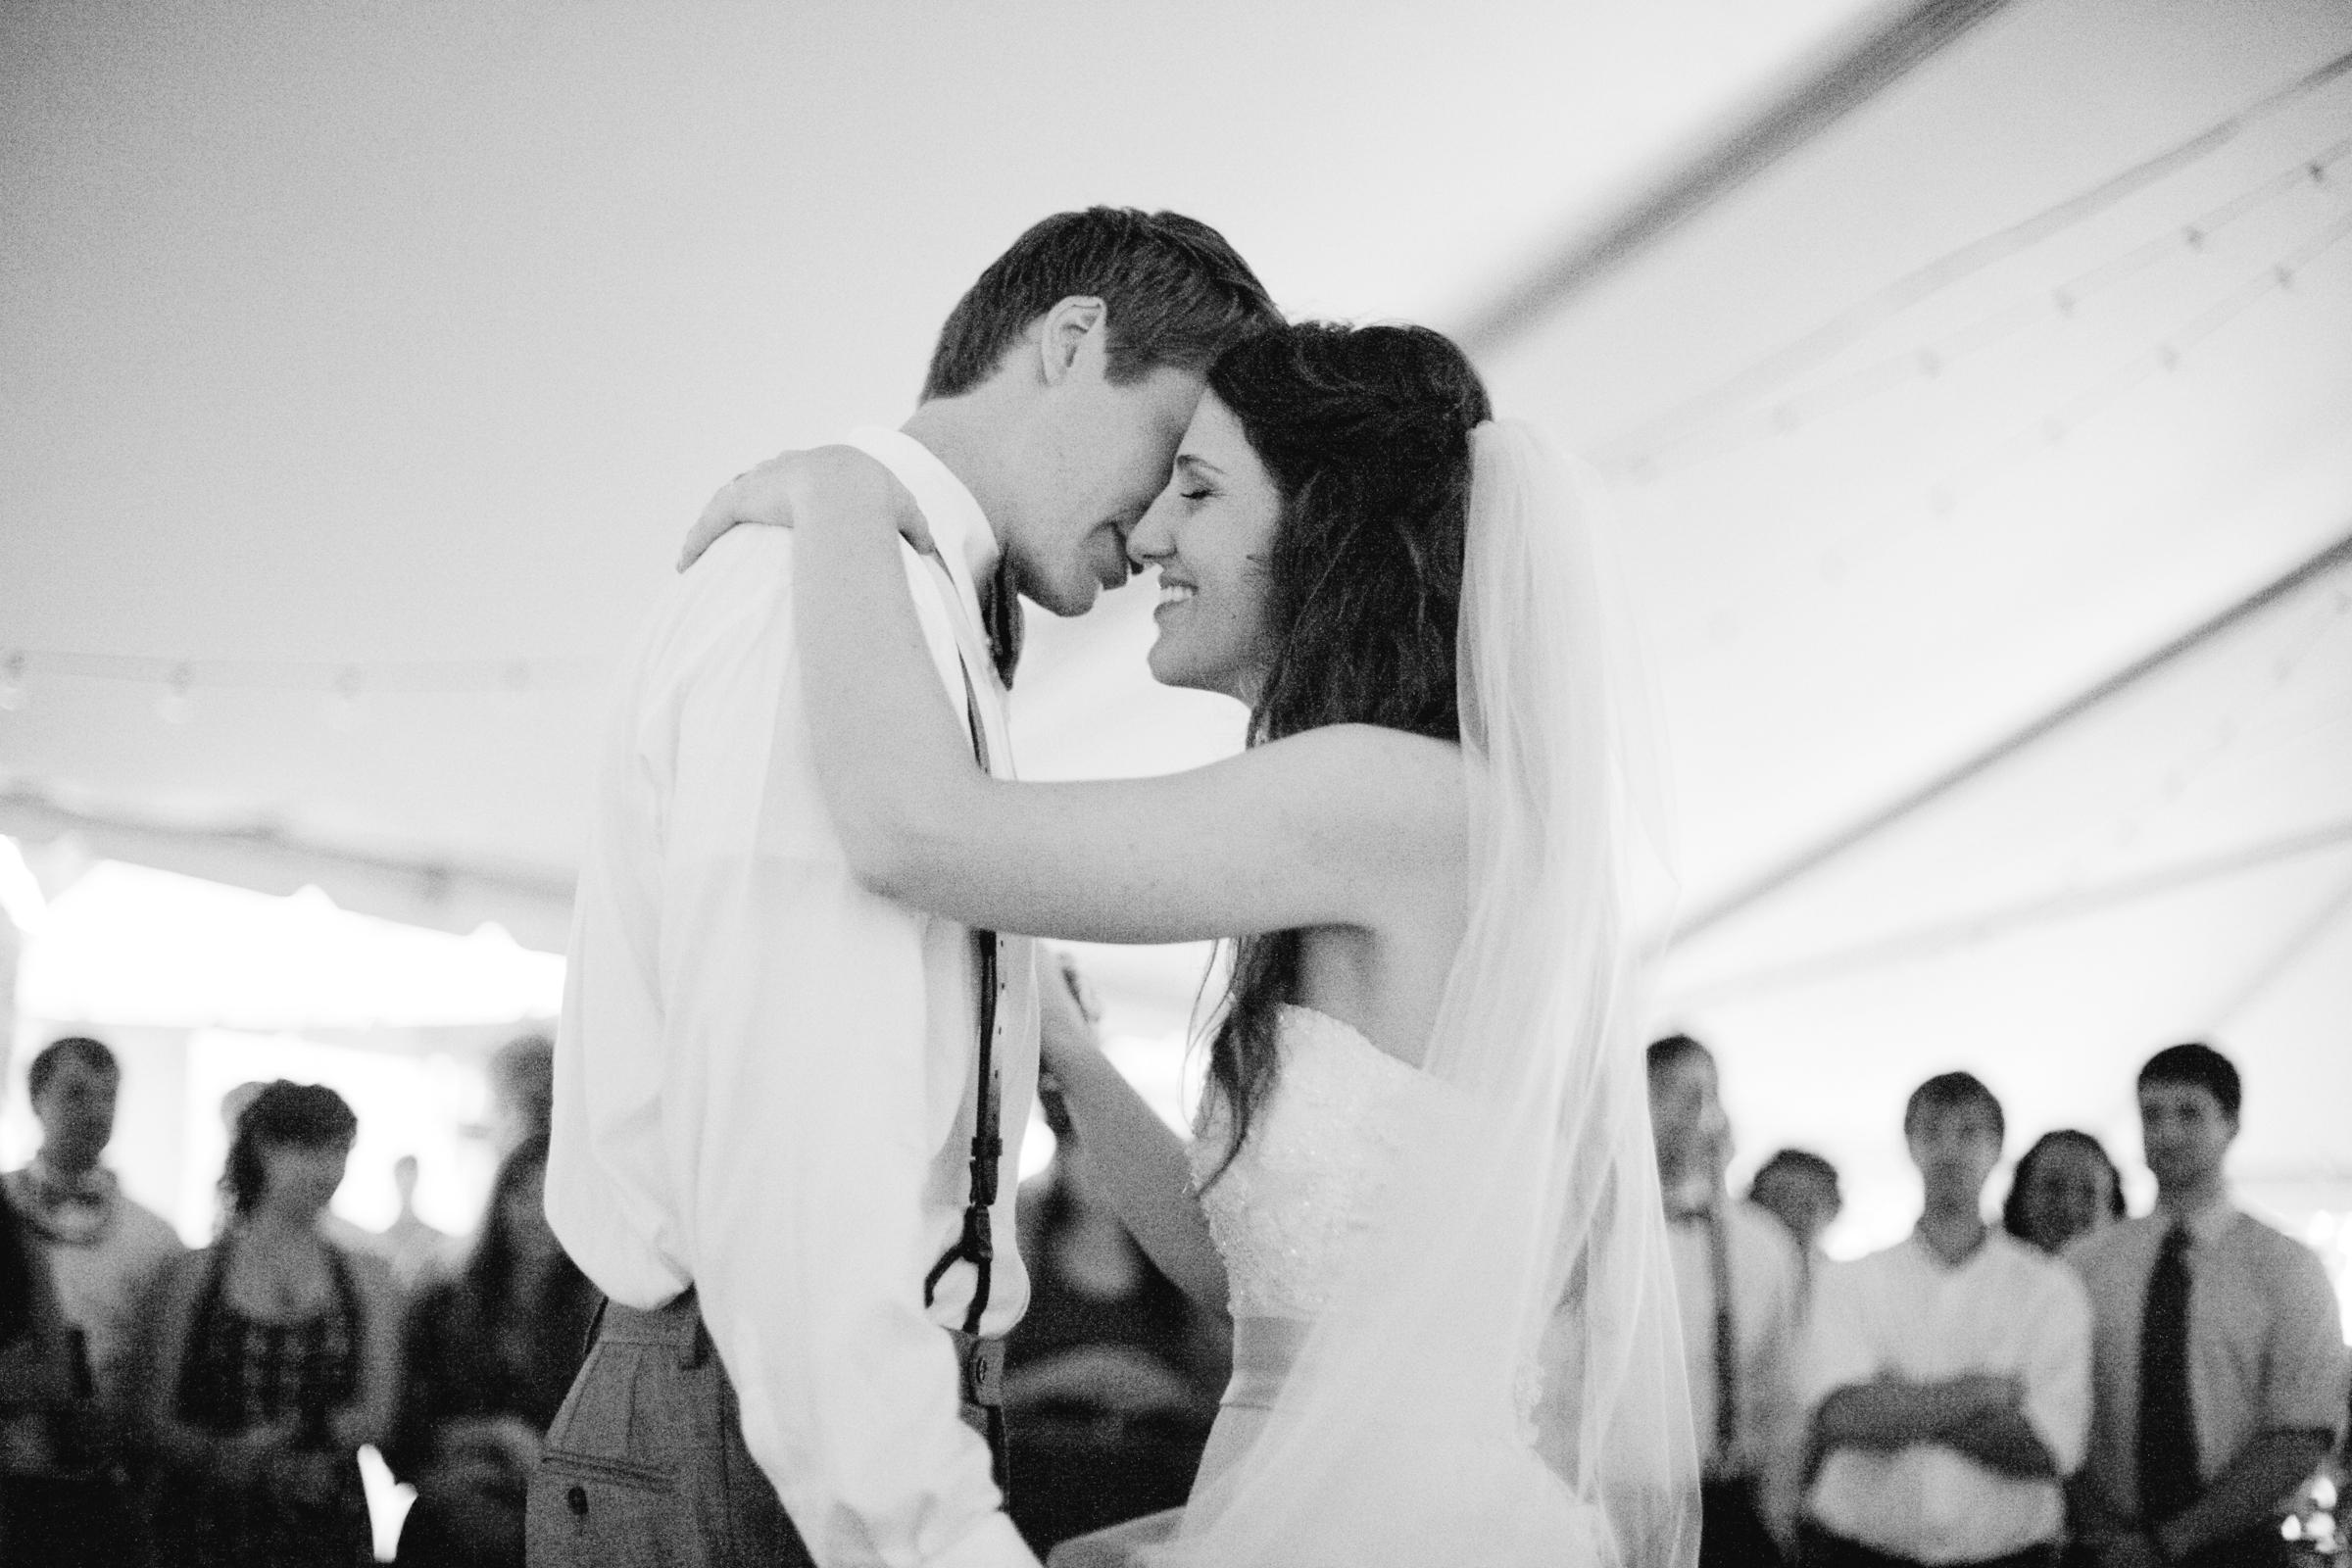 st_simons_island_wedding_photographer_shannon_griffin_0040.jpg